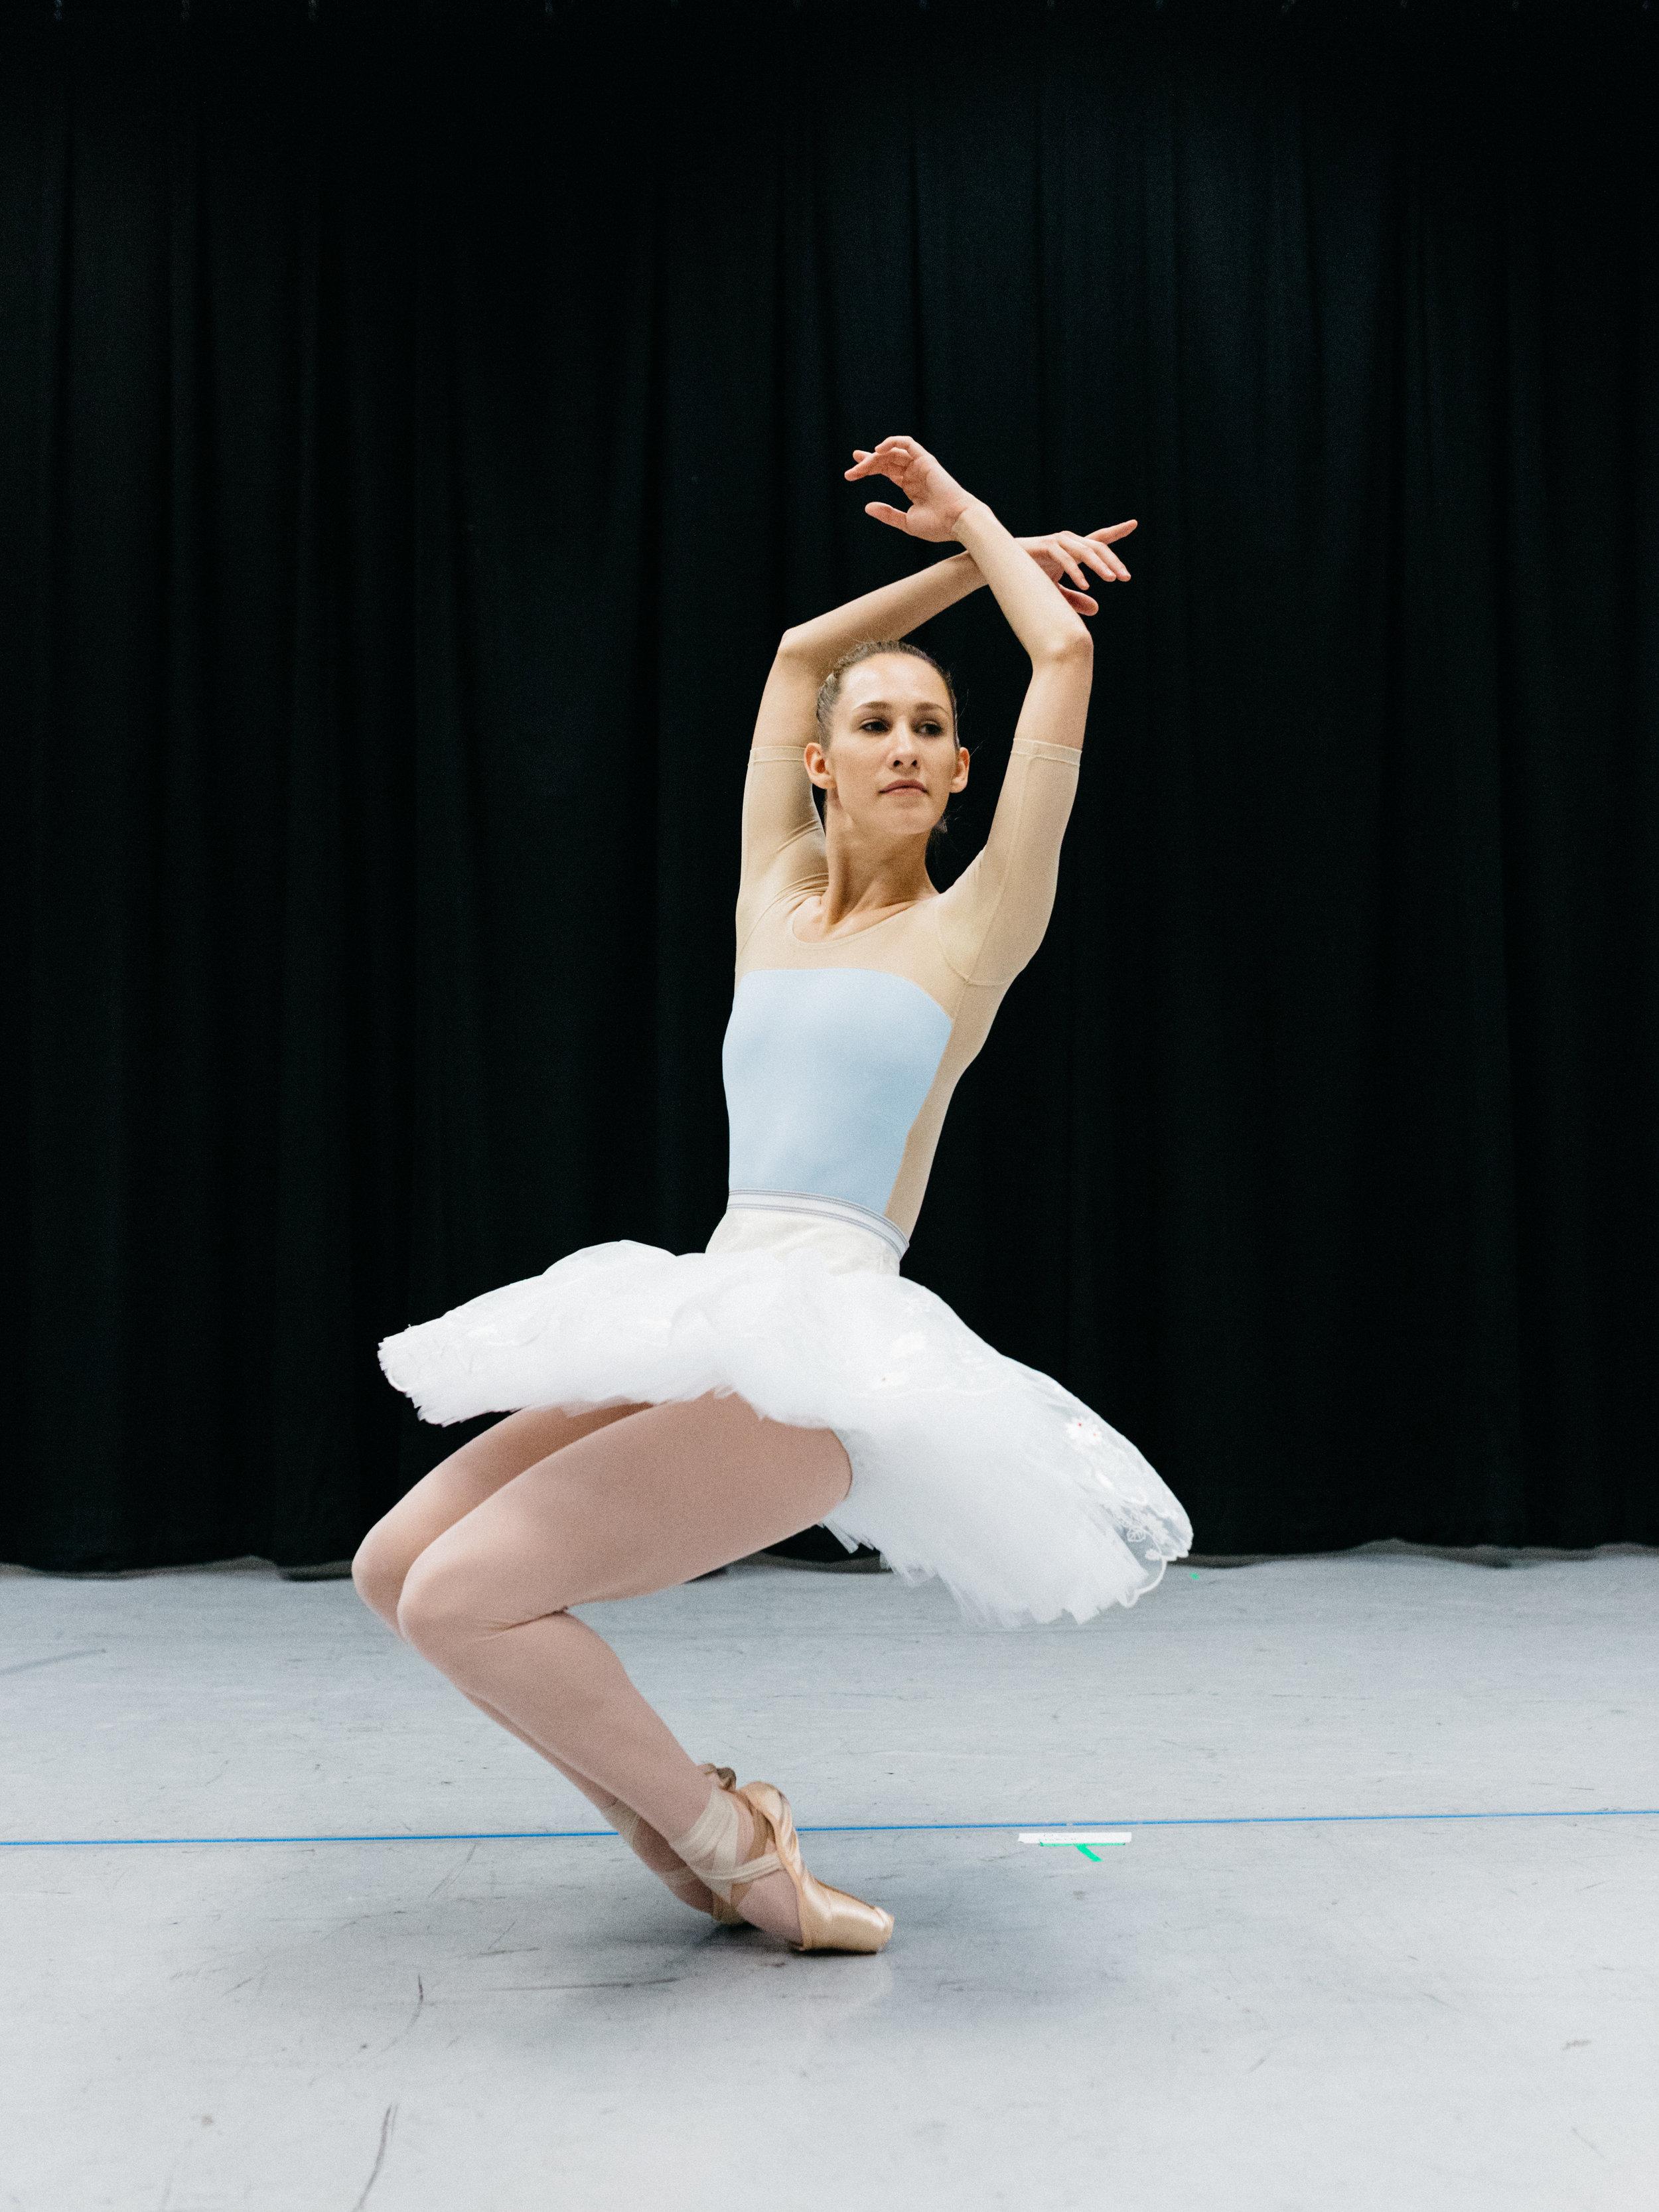 Jessica_Ballet-19.JPG